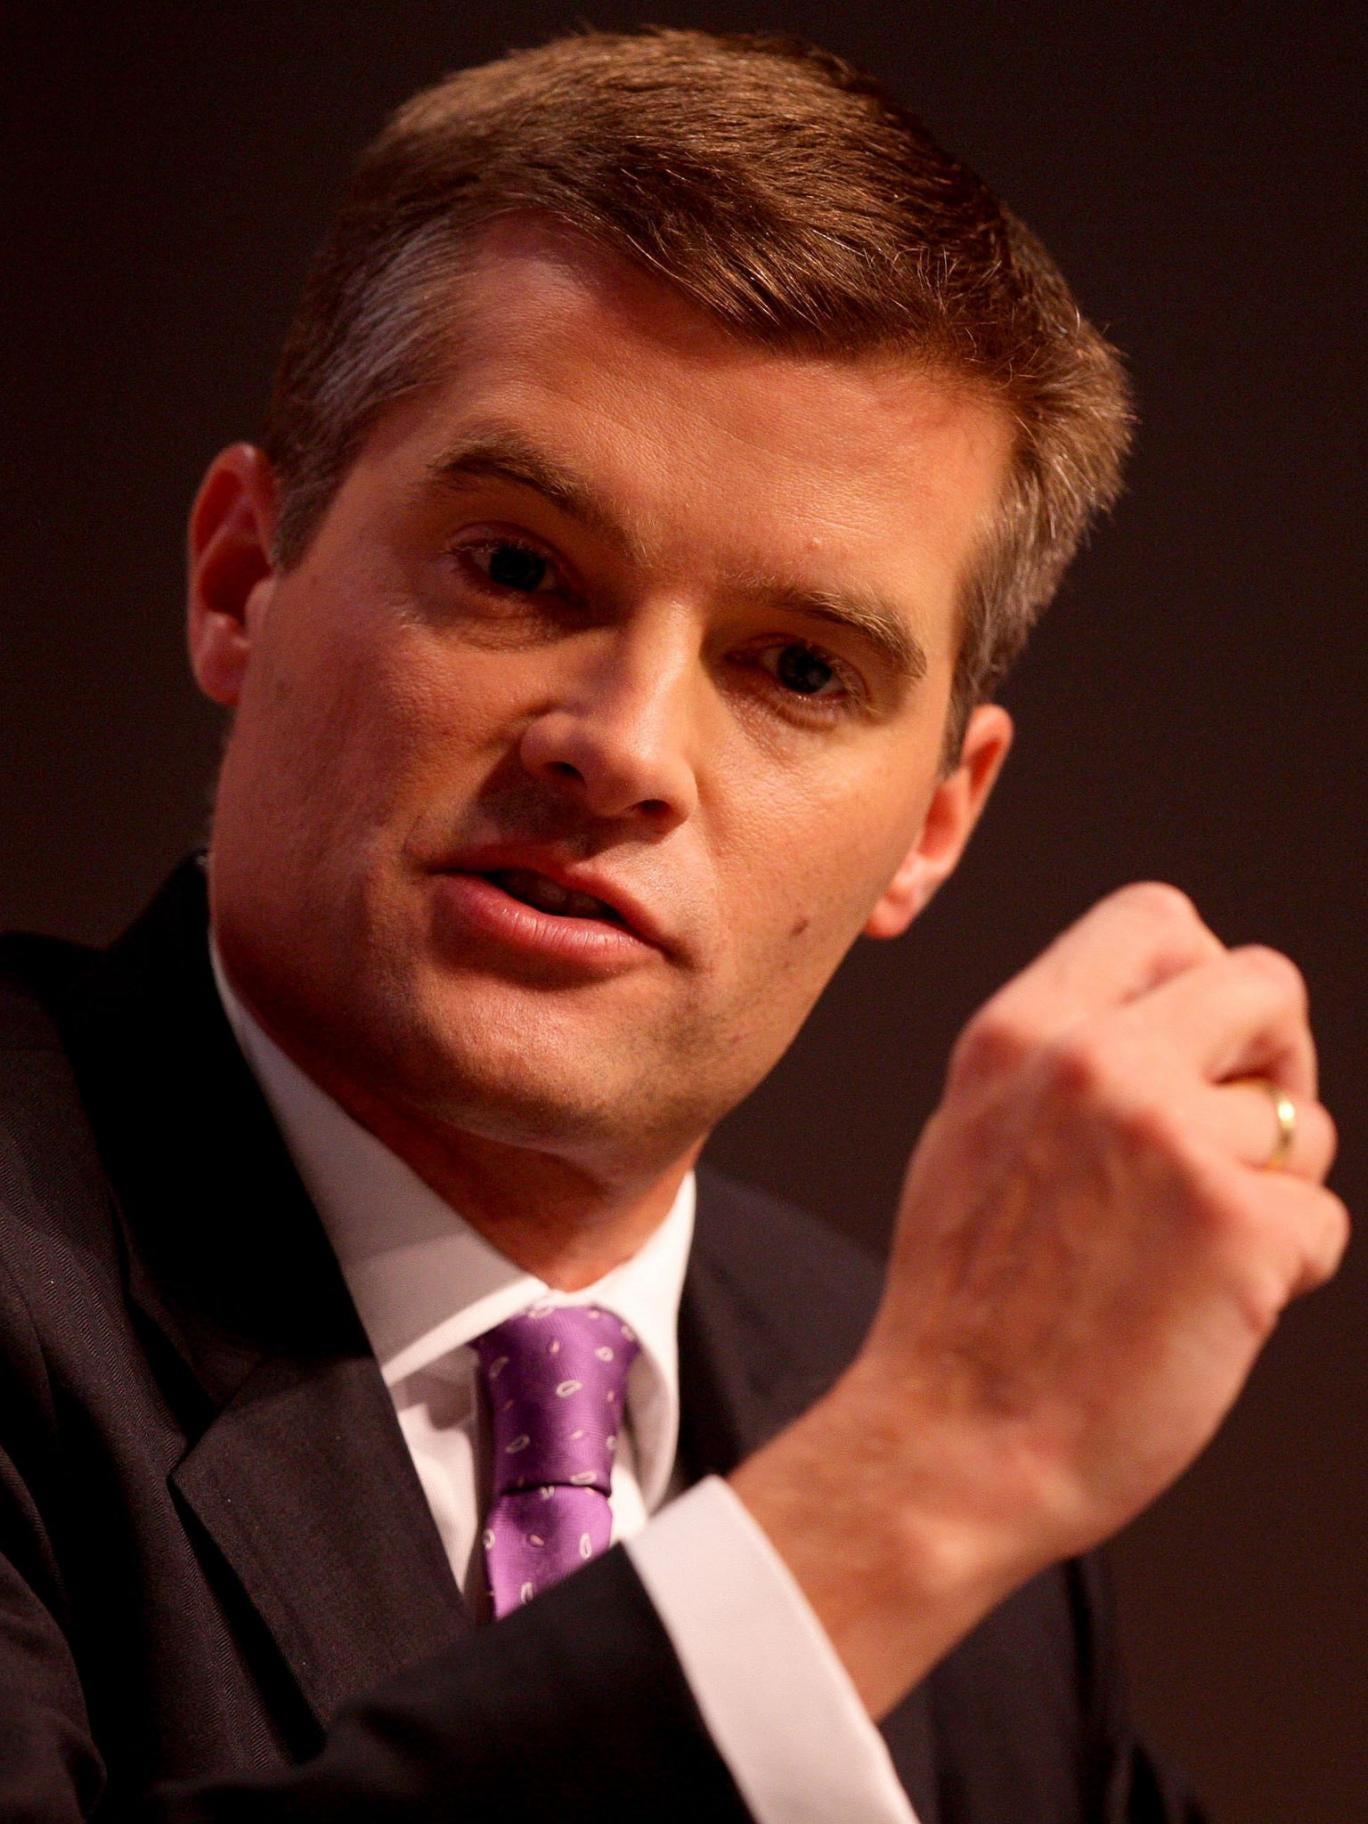 Former Immigration Minister Mark Harper